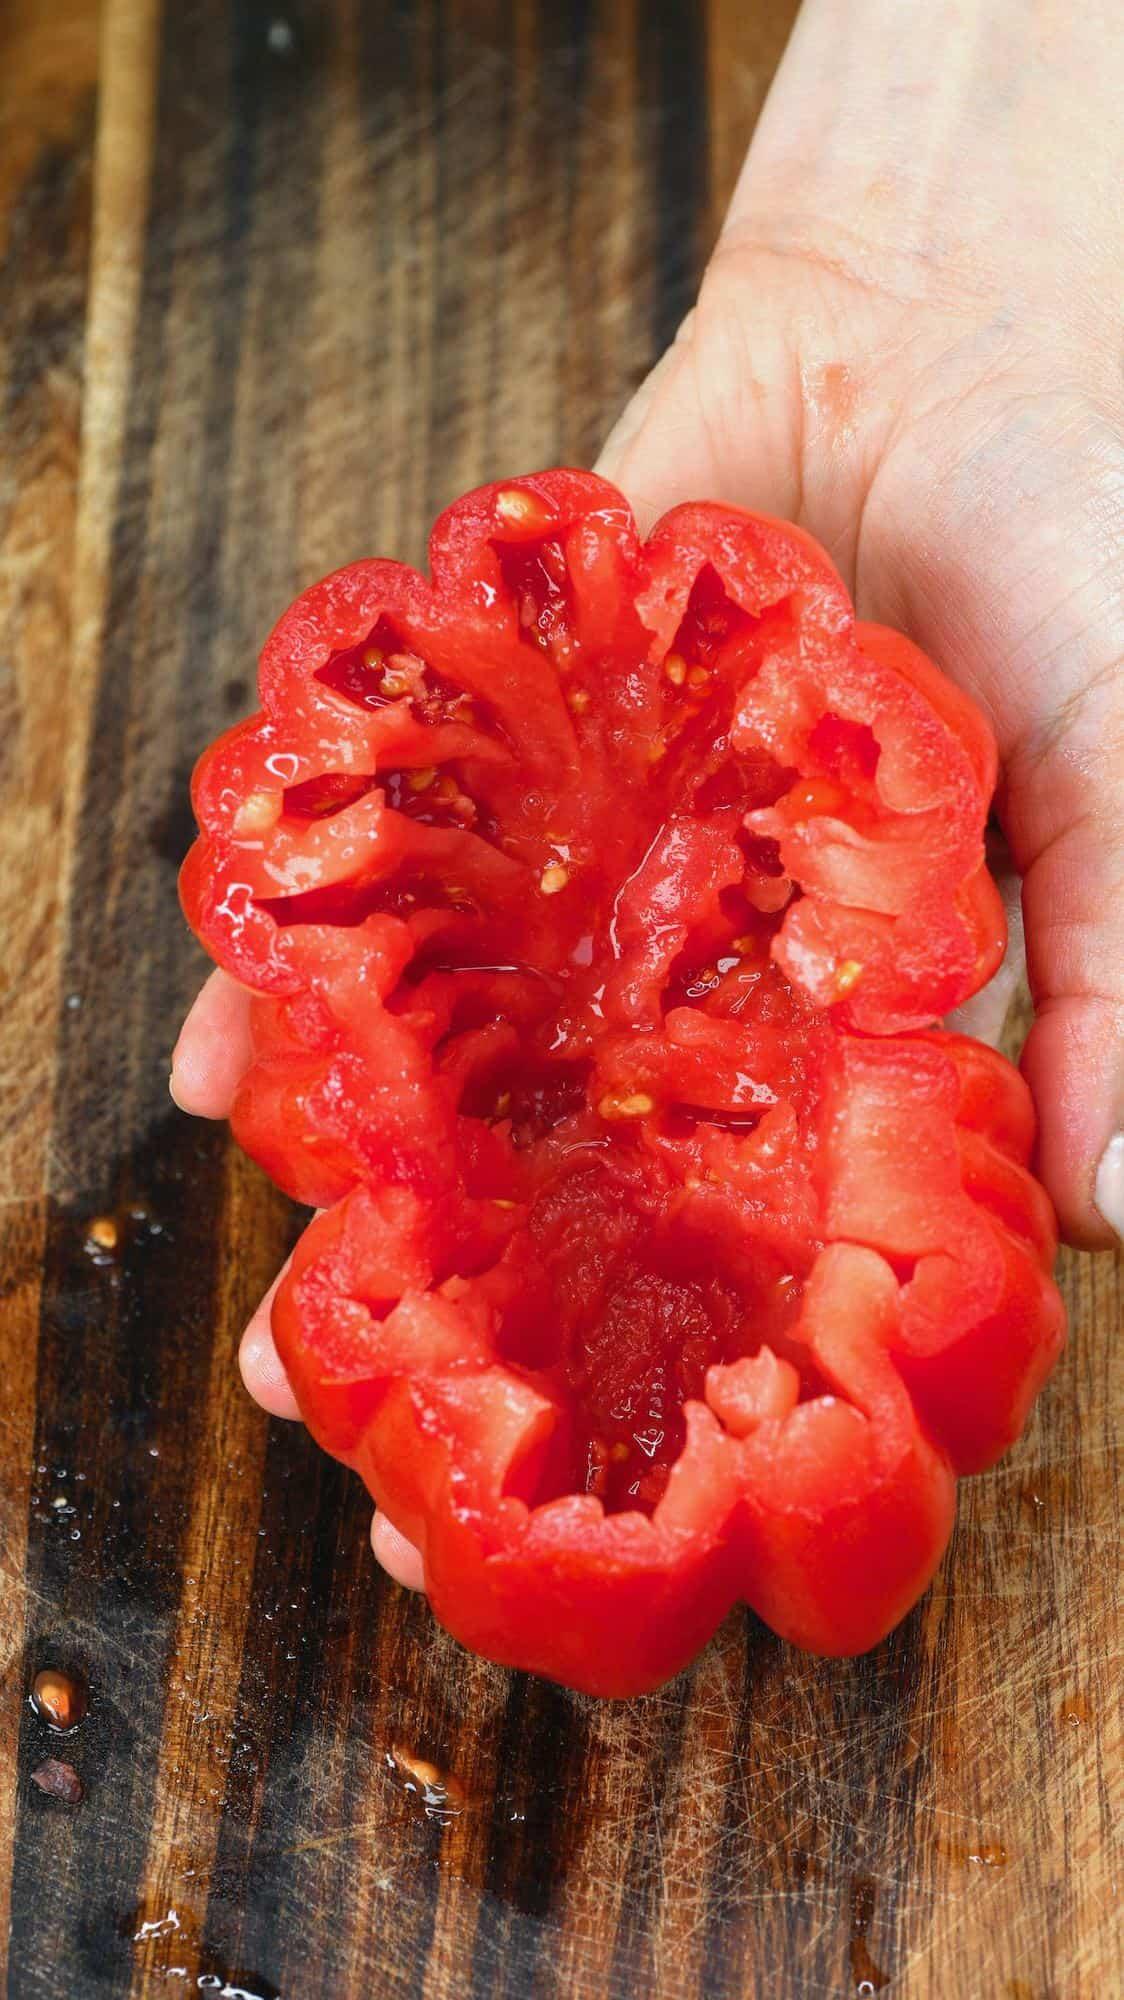 Holding a cored tomato